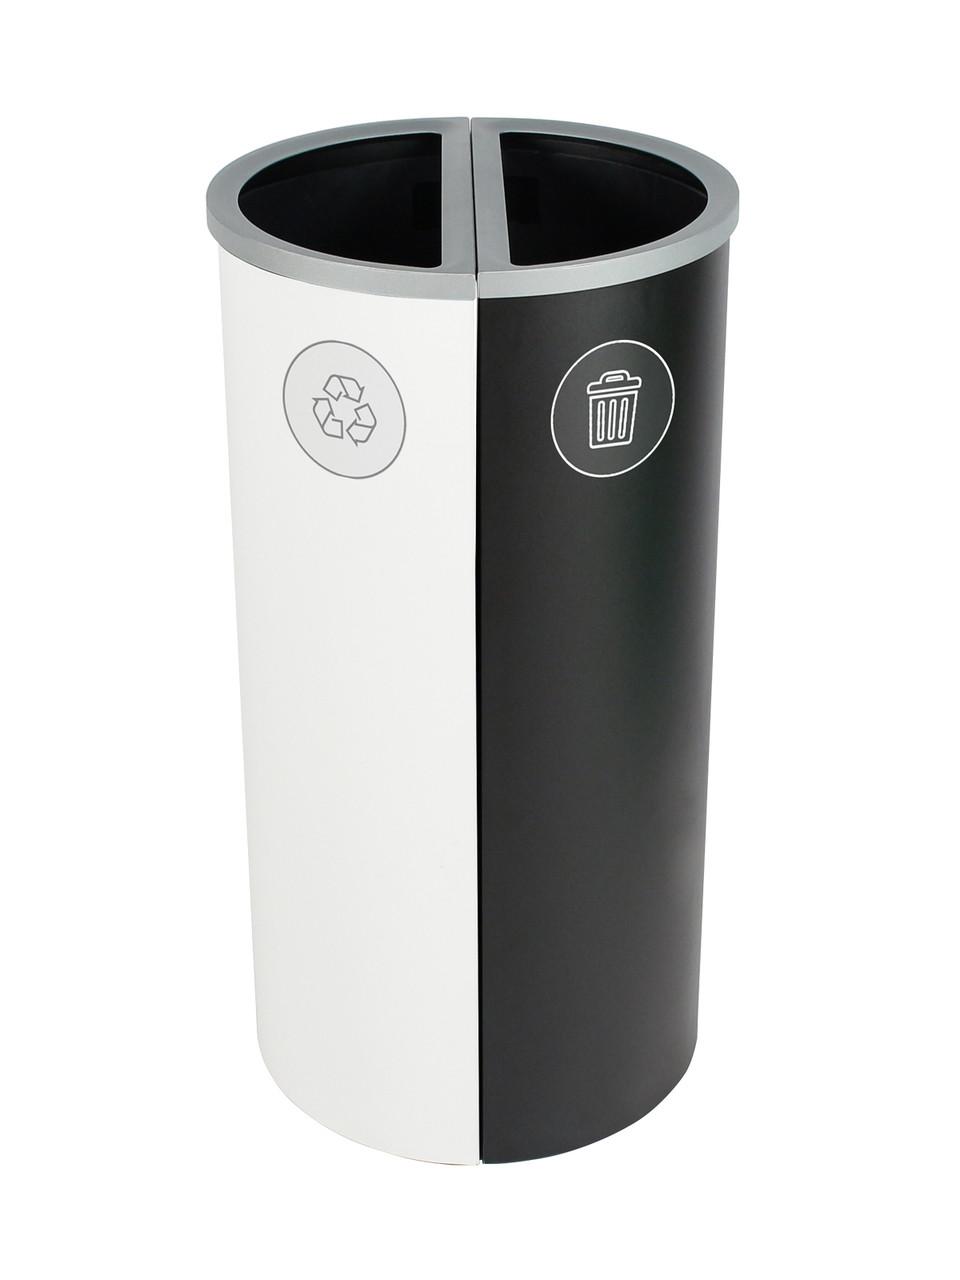 16 Gallon Spectrum Round Trash Can & Recycle Bin White/Black 8107087-44